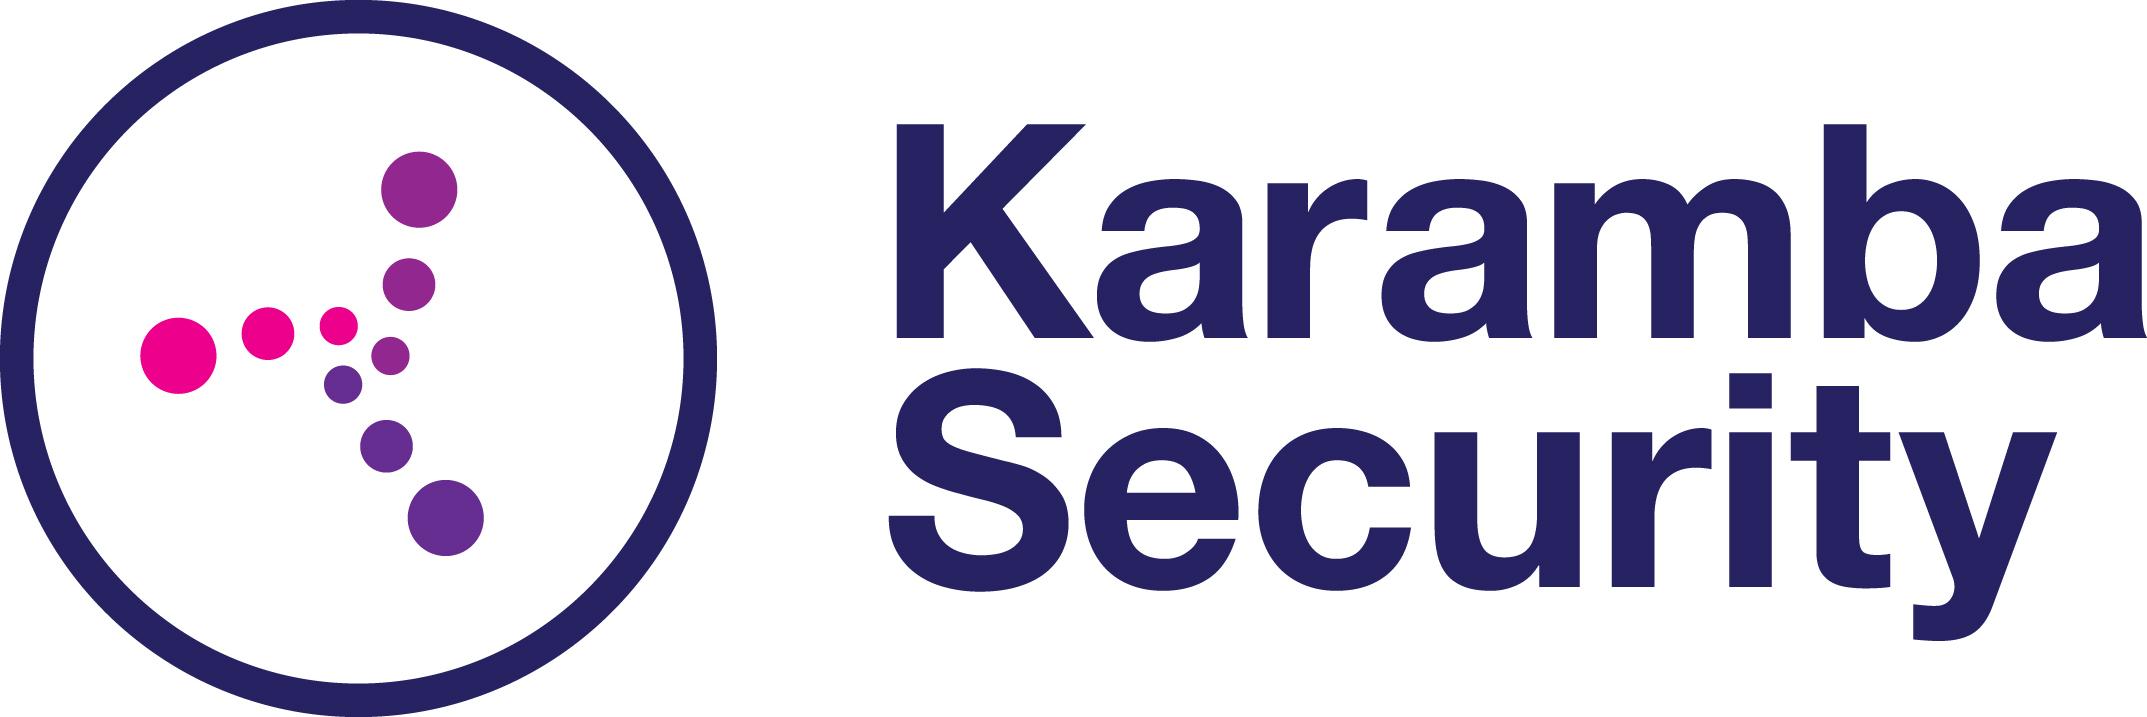 Image result for Karamba Security logo